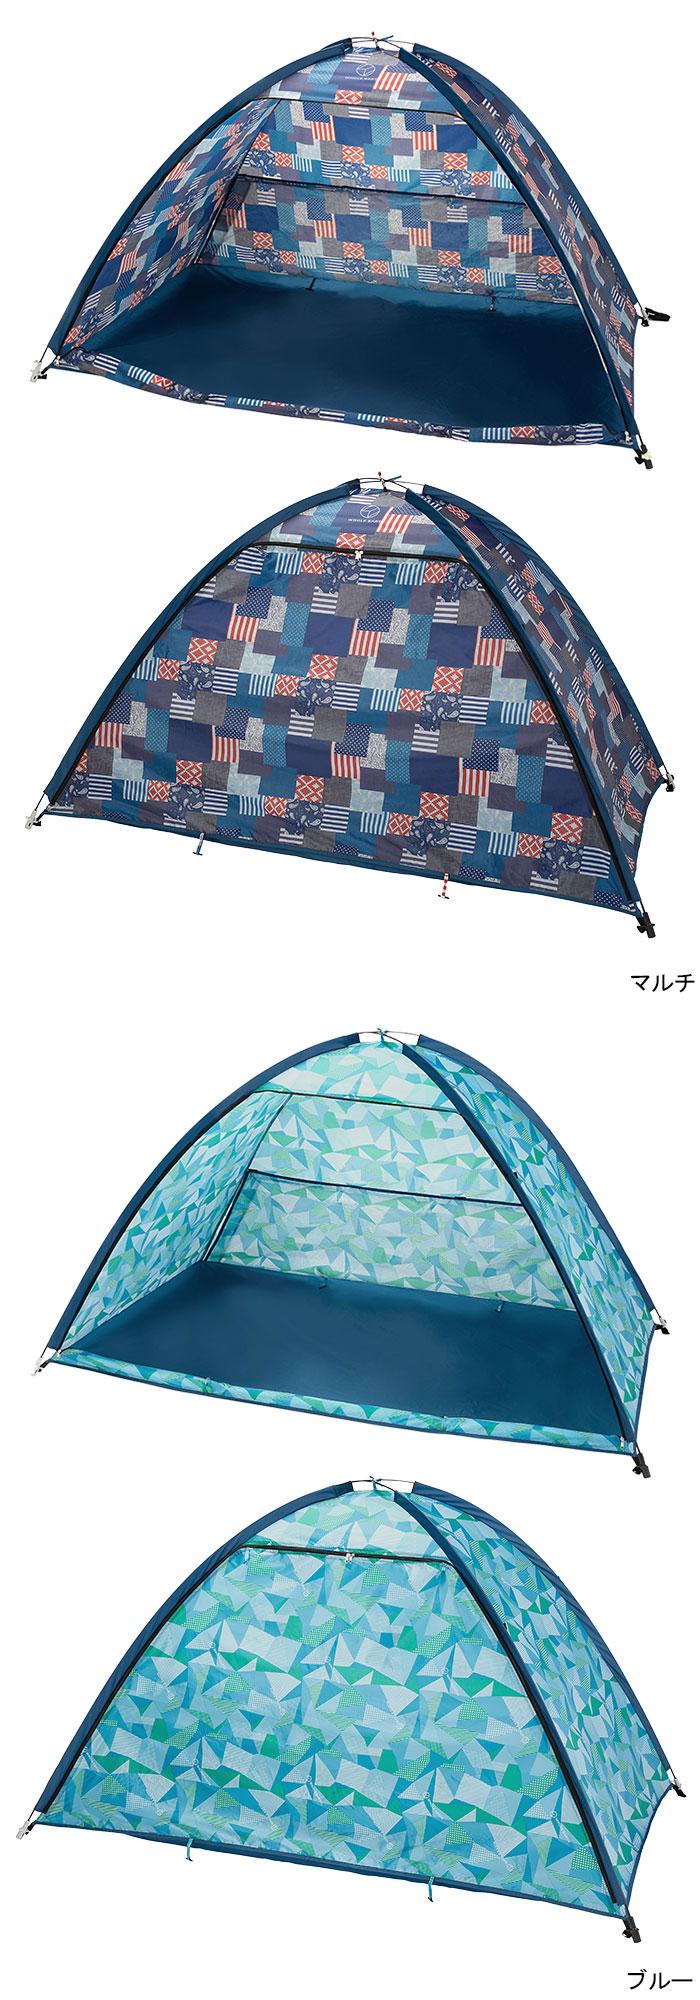 WHOLE EARTHホールアースのテント Full Closed Sunshade10